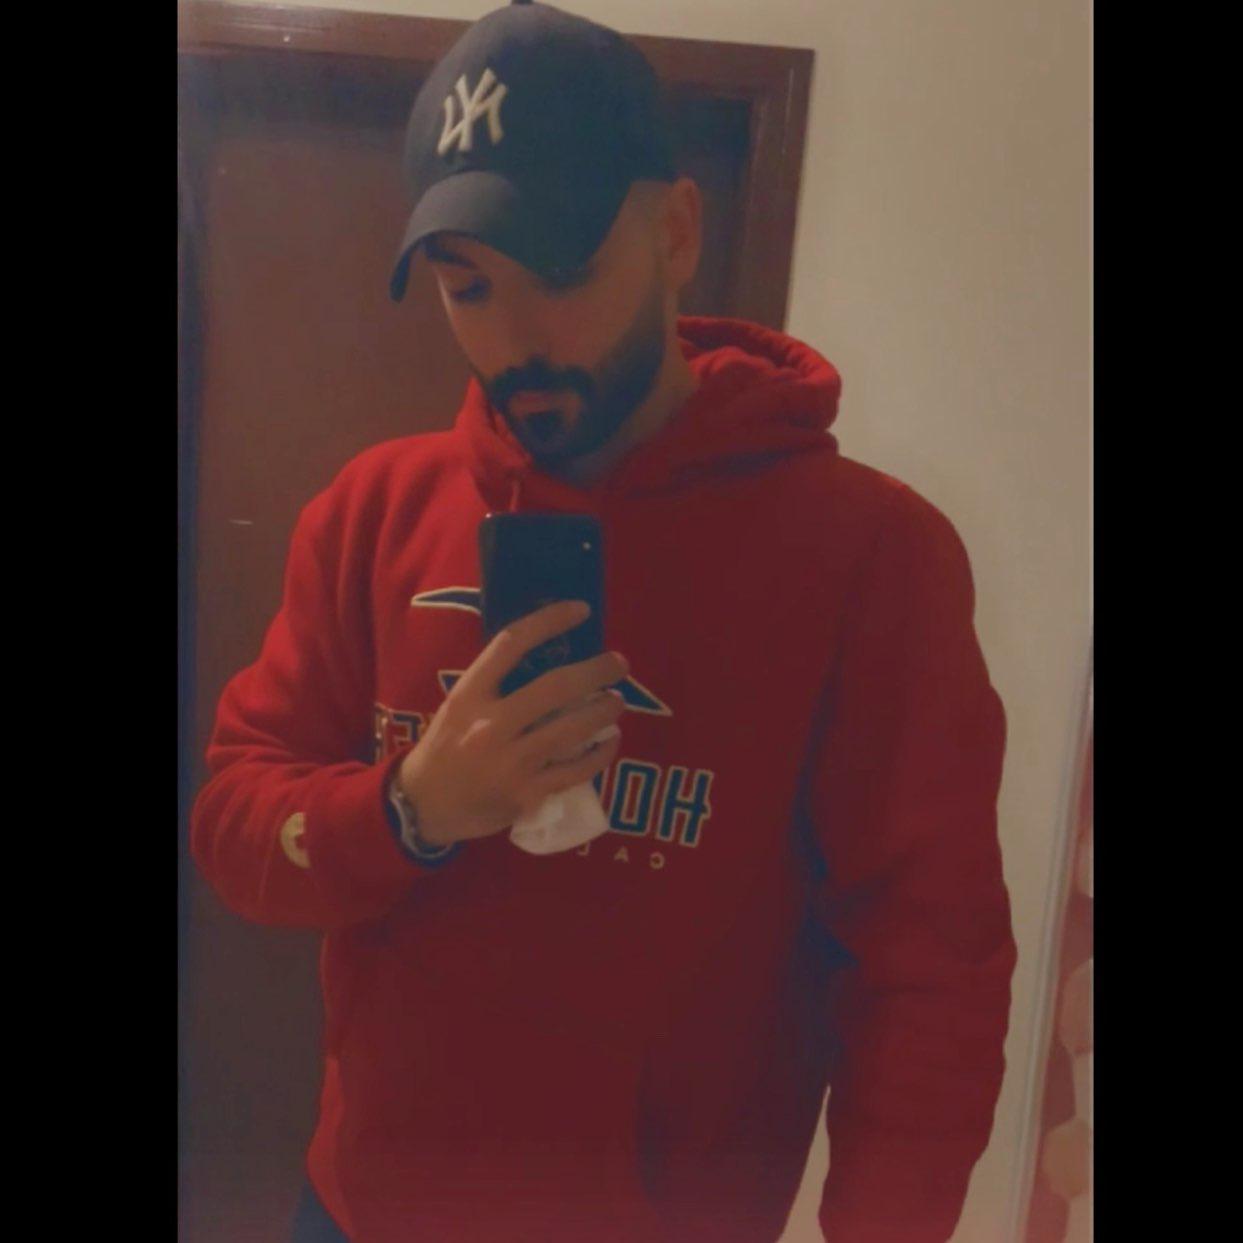 Abdulrahman Al Clubhouse